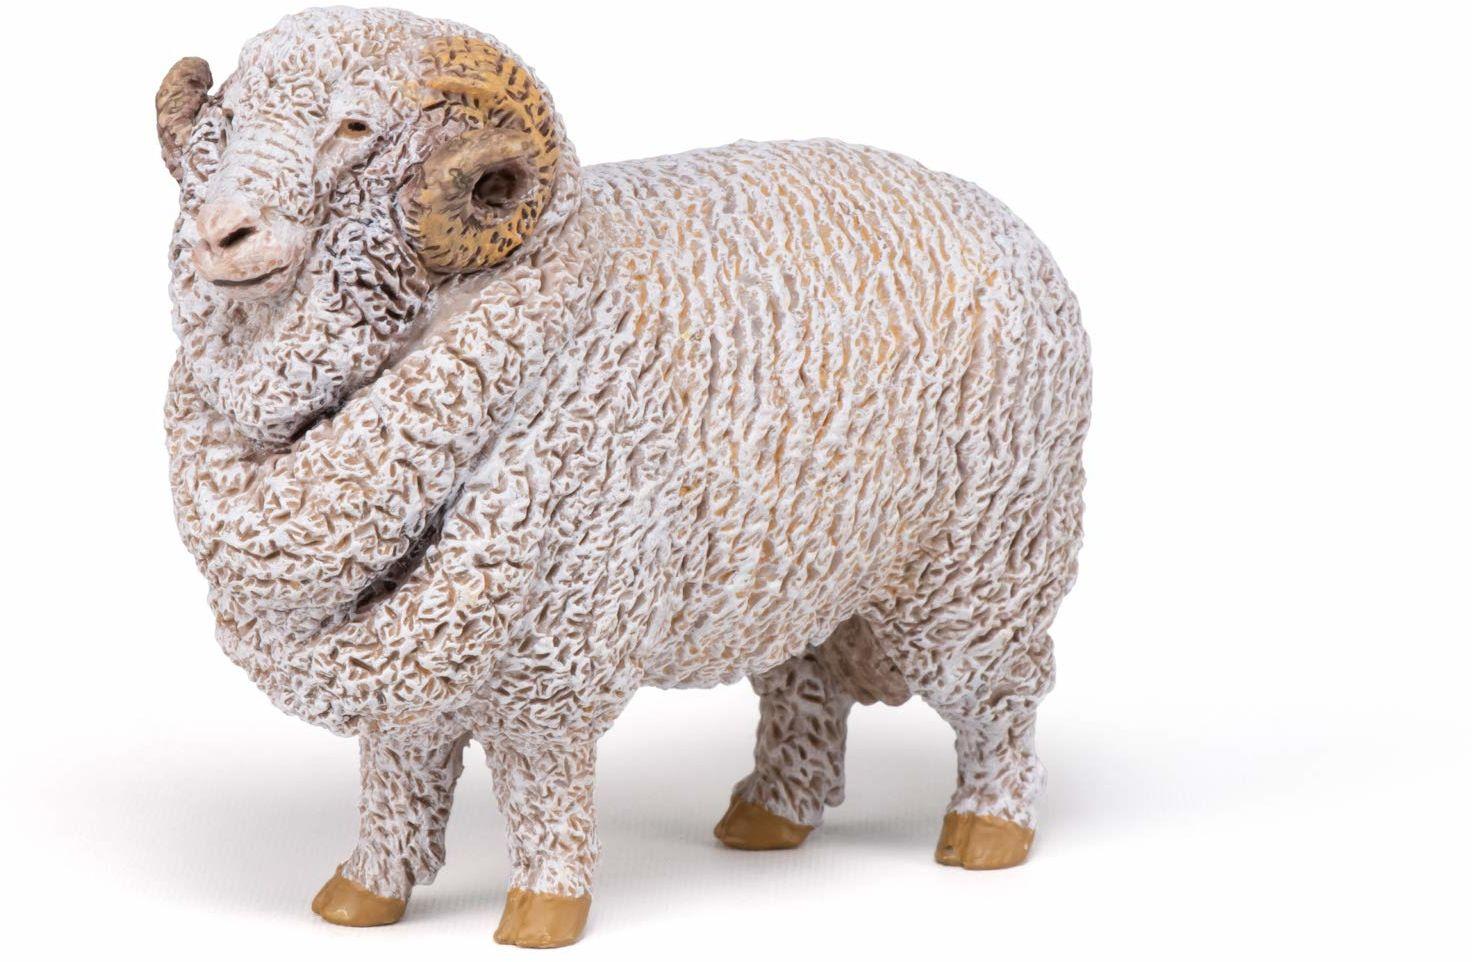 Papo 51174 Merino owca FARMYARD FRIENDS figurka wielokolorowa